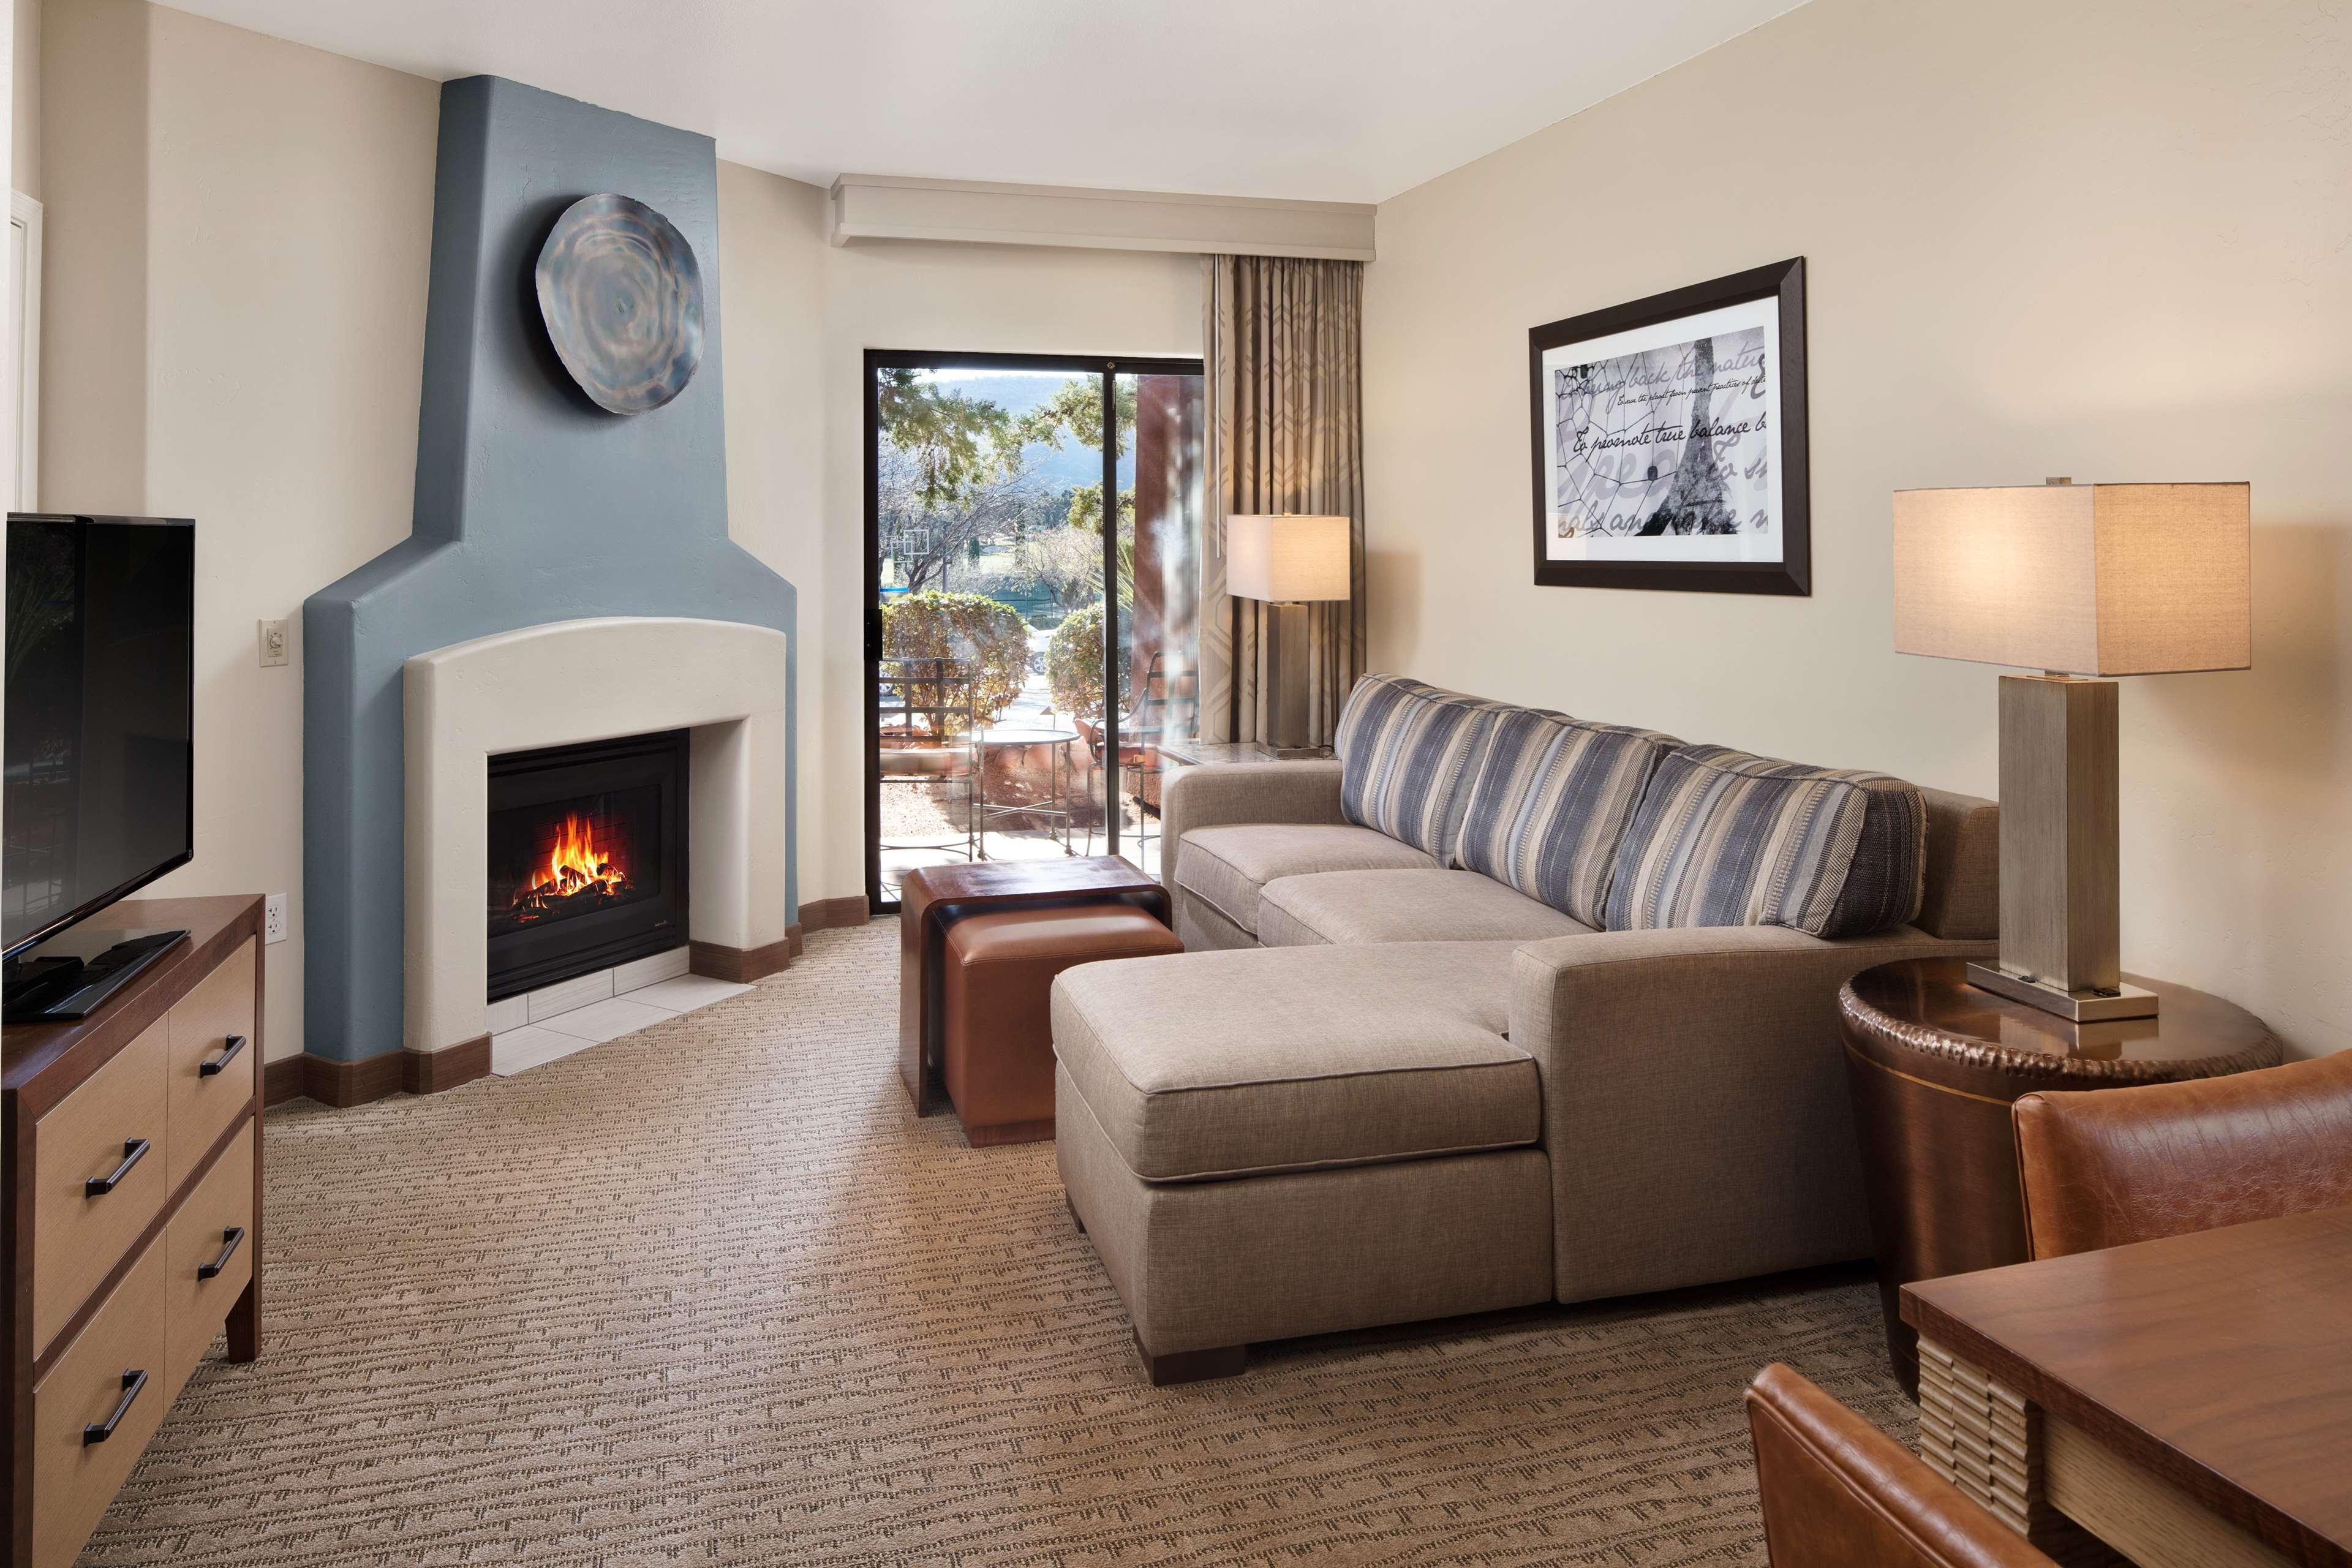 Hilton Sedona Resort at Bell Rock image 44